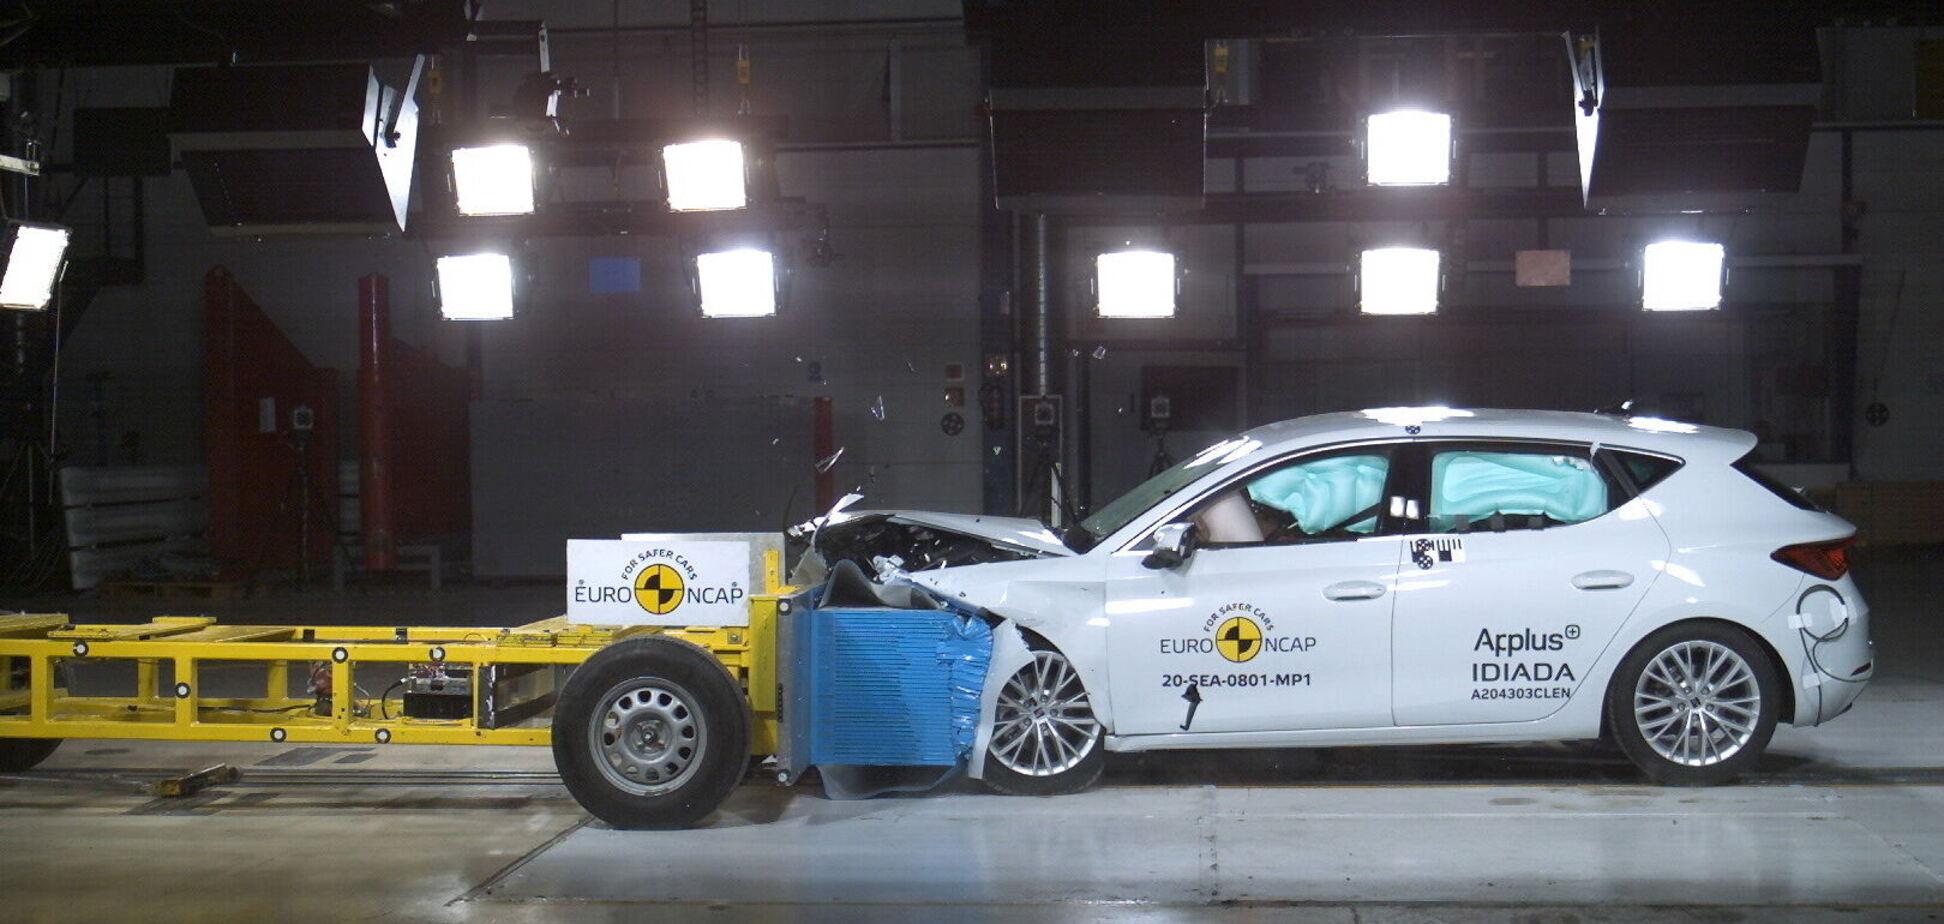 Euro NCAP подвергла краш-тестам 5 новых авто